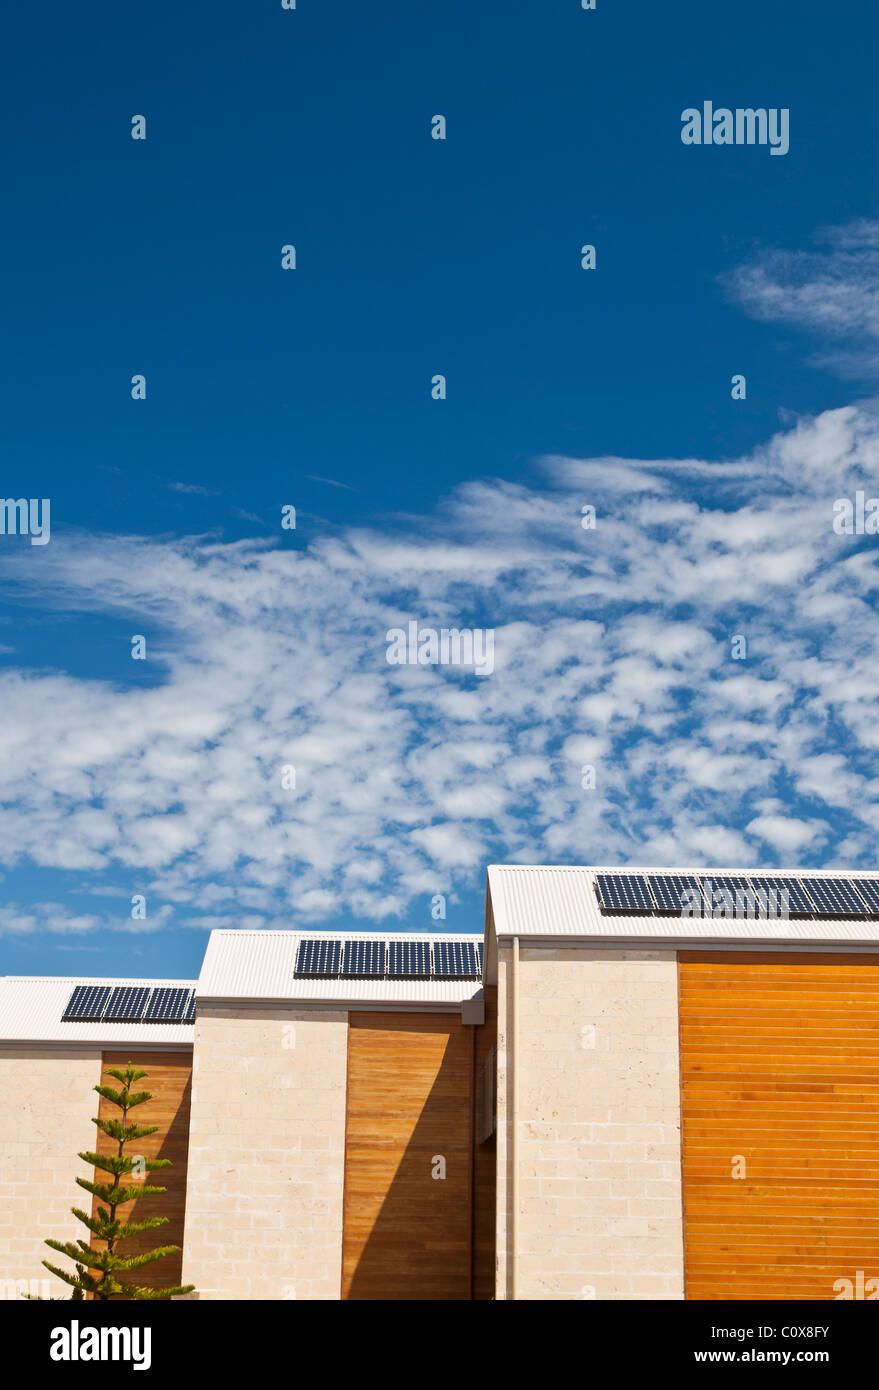 Solar panels on house roofs in Australia - Stock Image